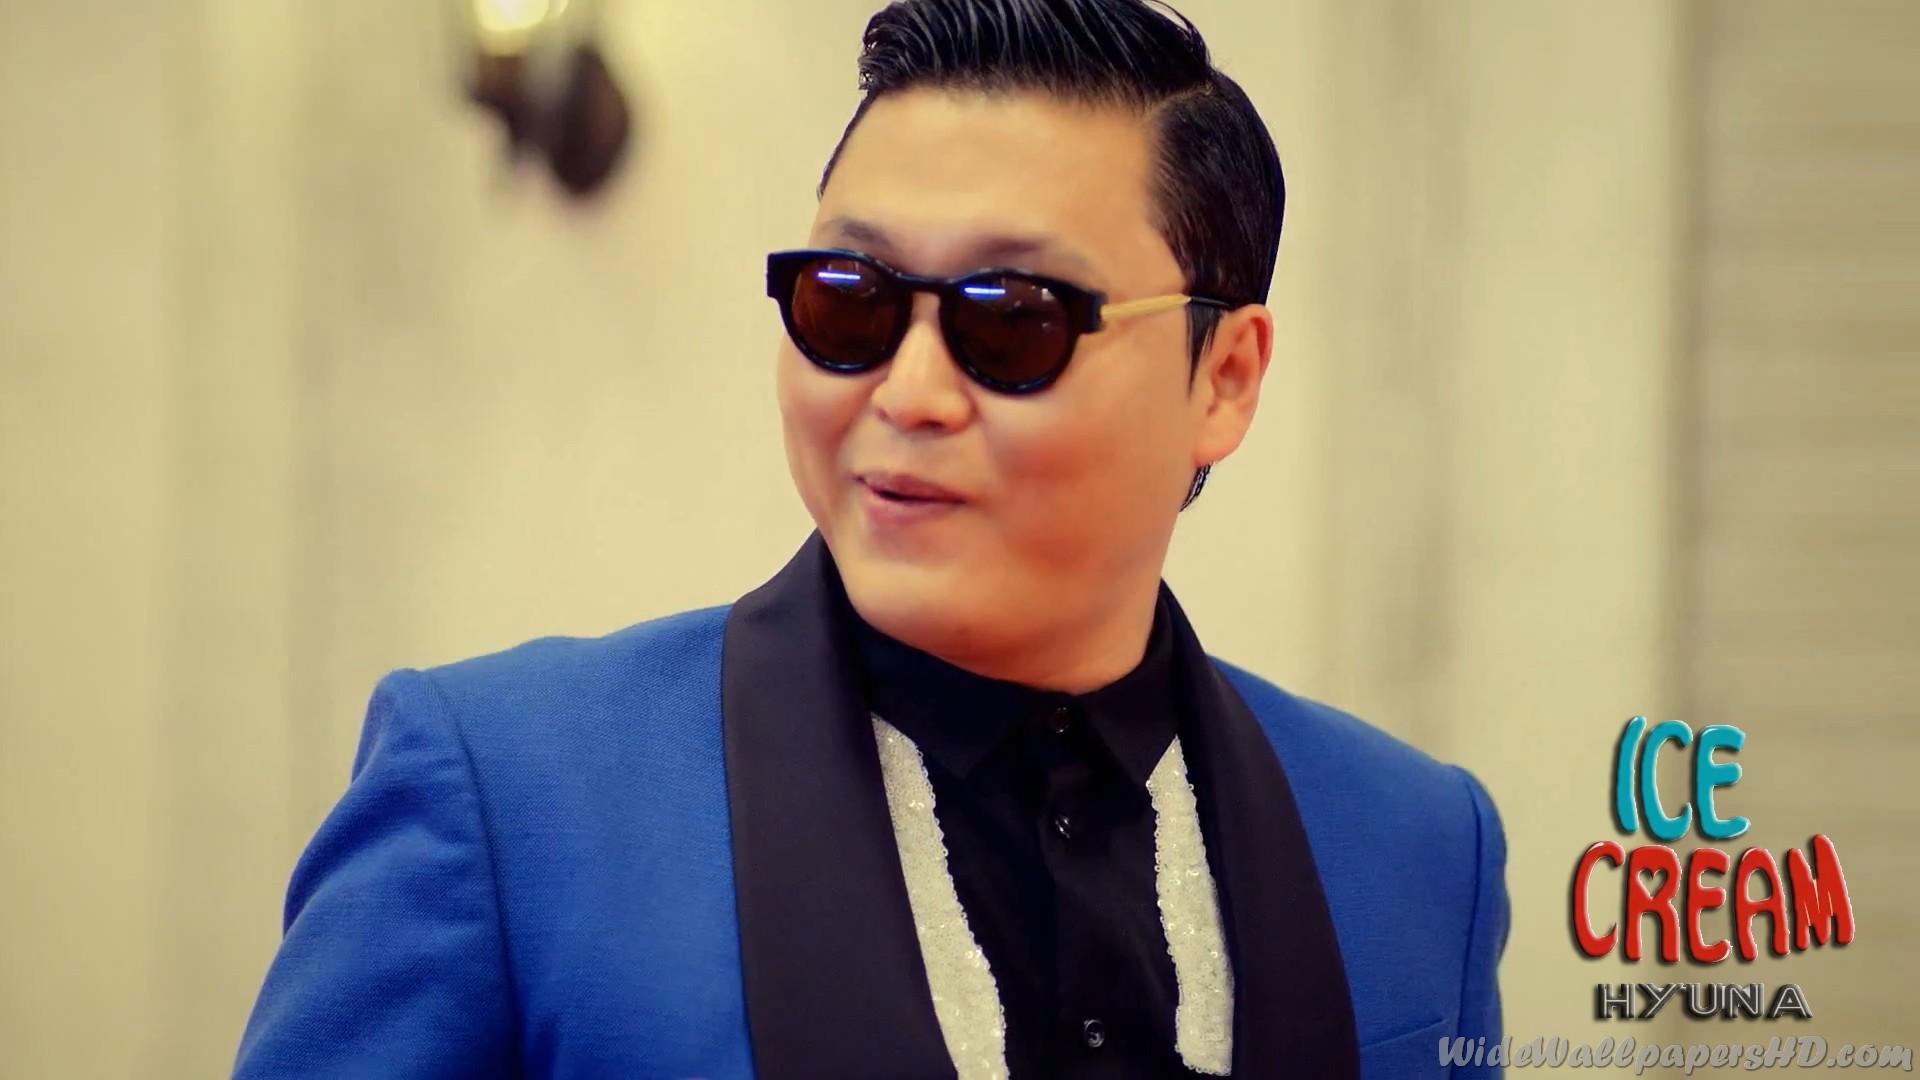 psy gangnam style halloween costume - slim-fit blue tuxedo